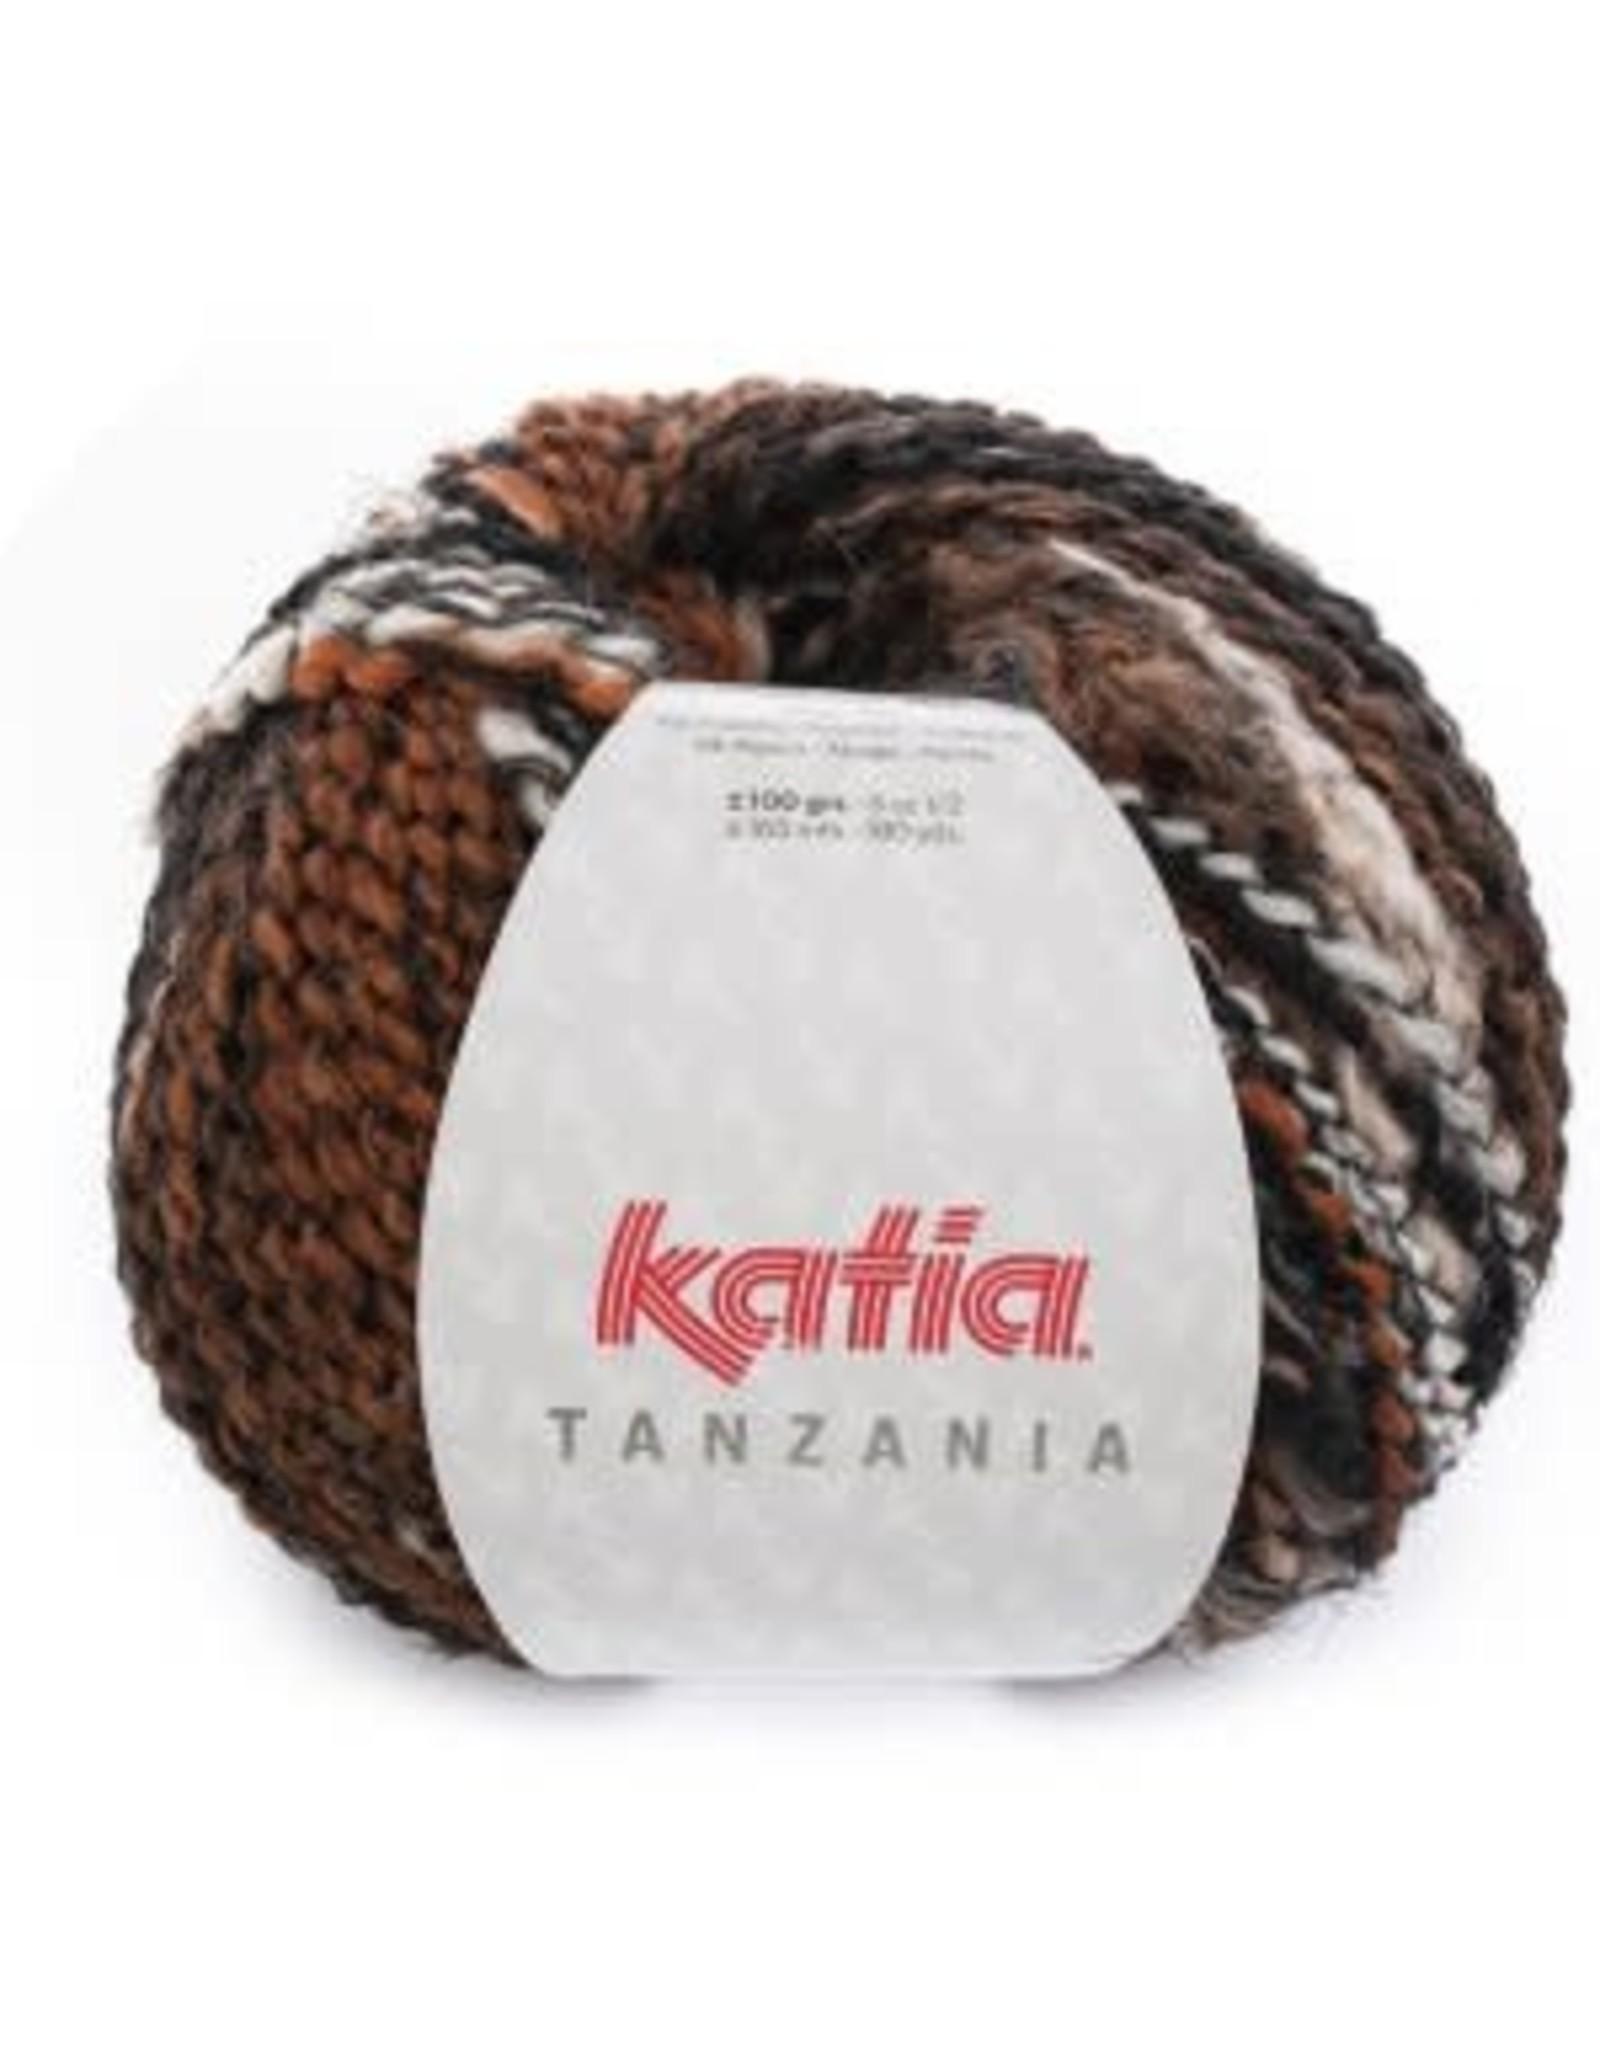 Katia Katia Tanzania 102 oranje-wit-zwart